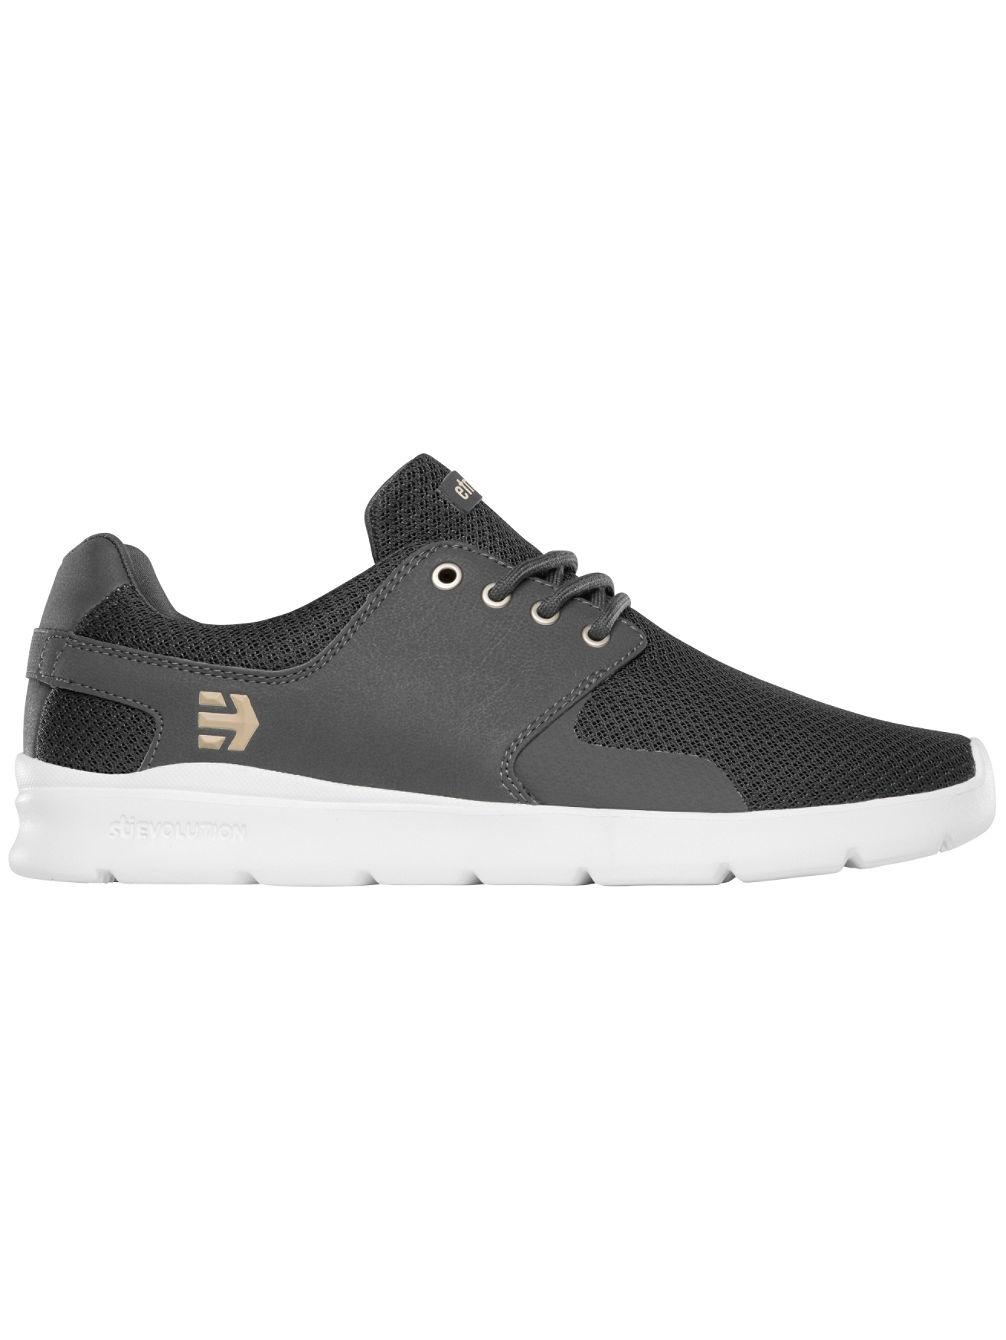 etnies-scout-xt-sneakers